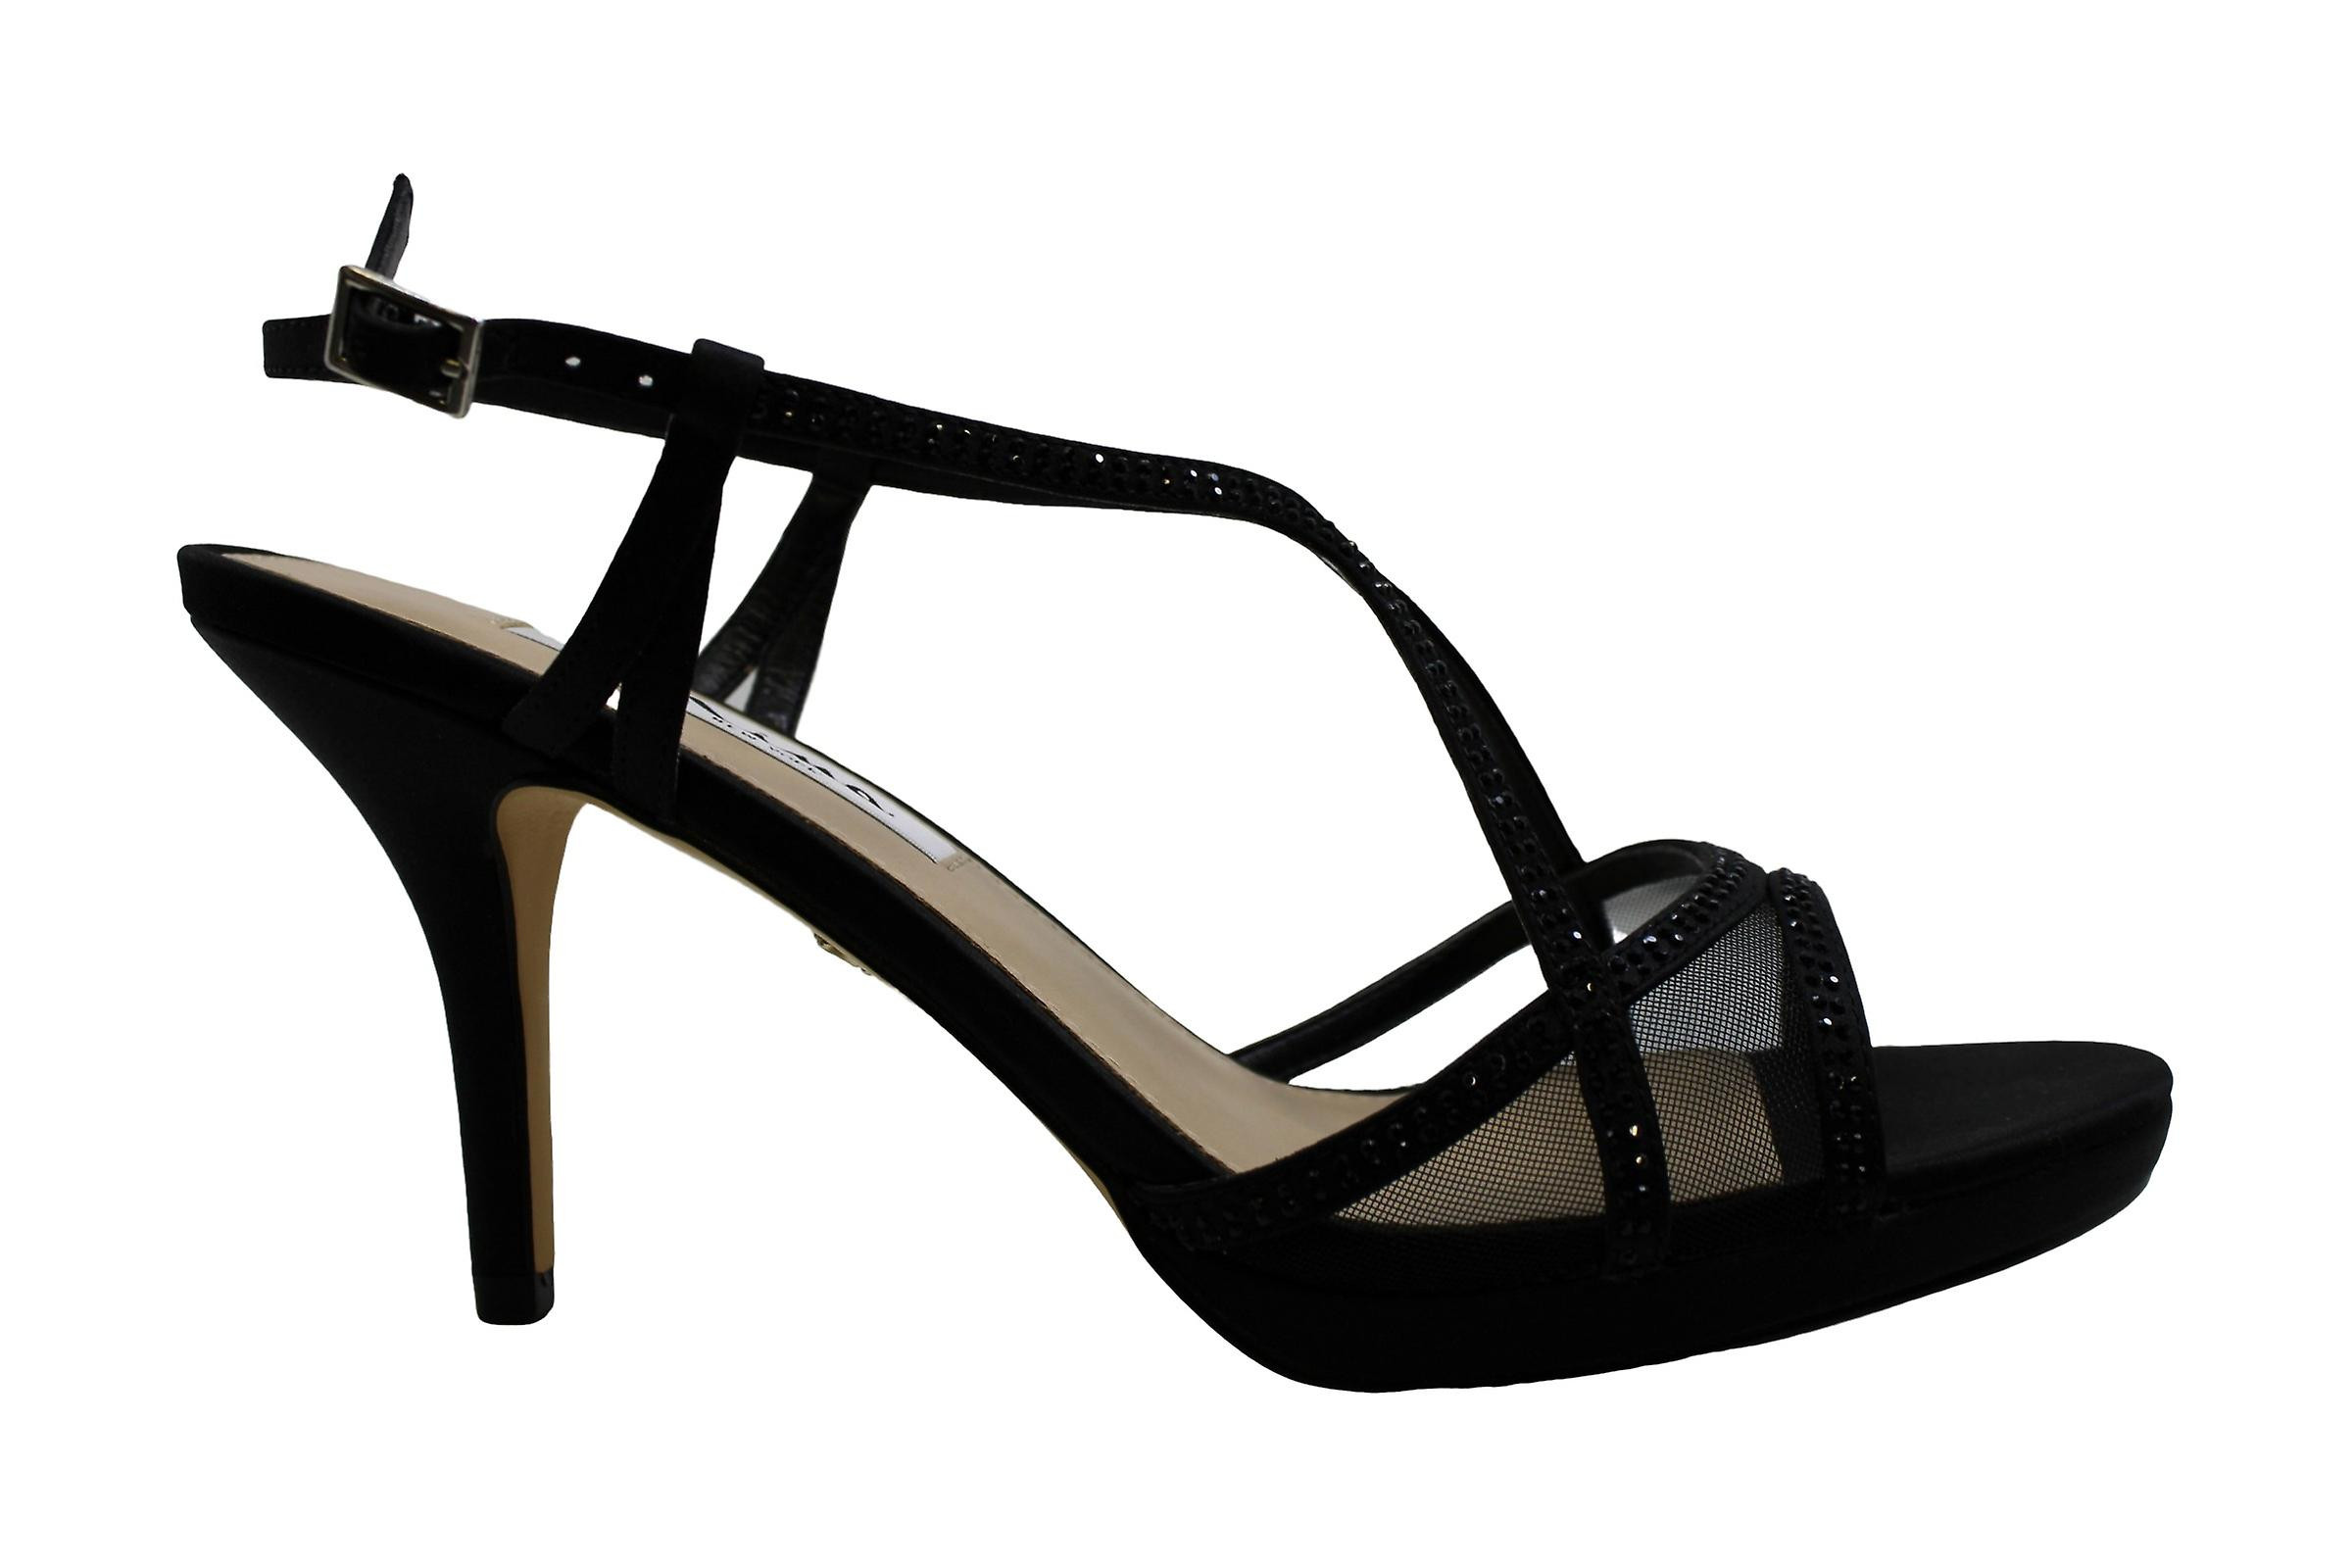 Nina Womens Blossom Open Toe Casual Strappy Sandals h05B4